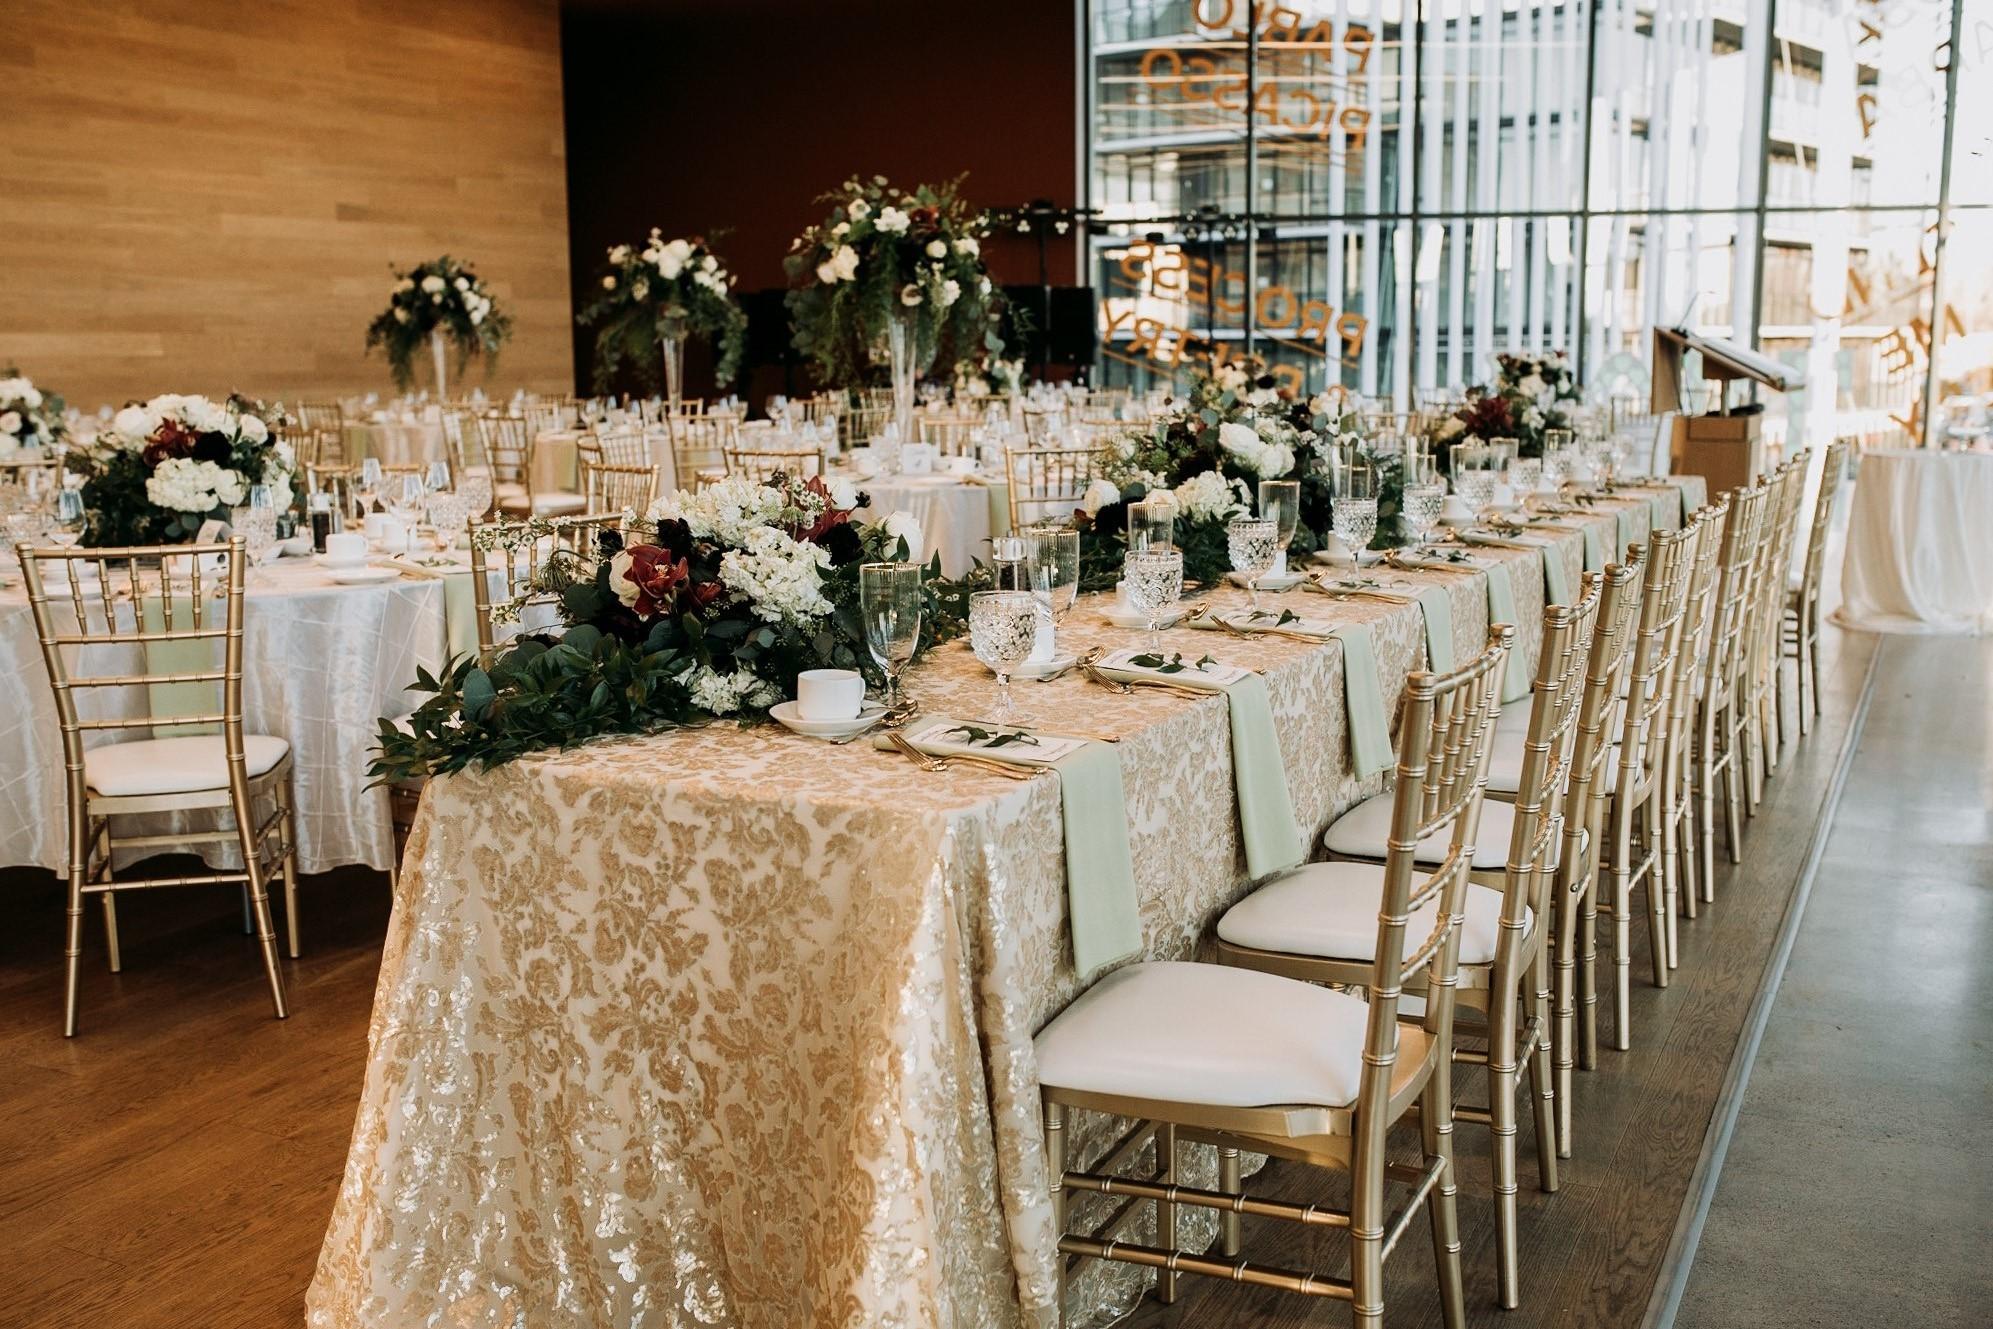 Head Table Wedding Setup at Remai Modern